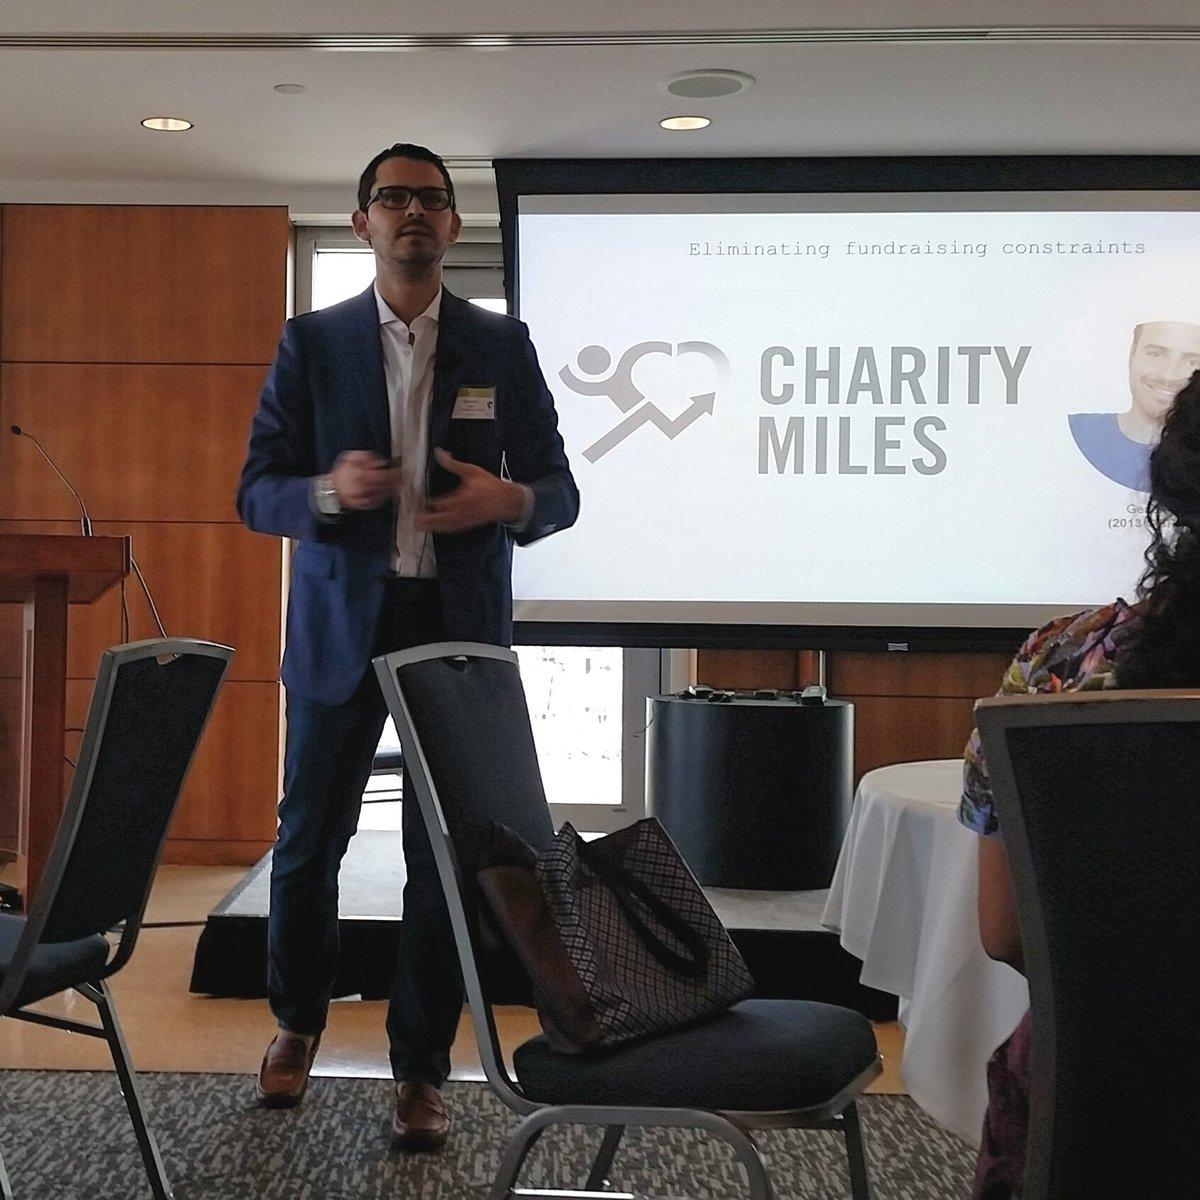 .@ManoloPaez of @GlobalGoodFund on key success factors of #socialentrepreneurship #LaRedSummit2017<br>http://pic.twitter.com/affVTUPOgu